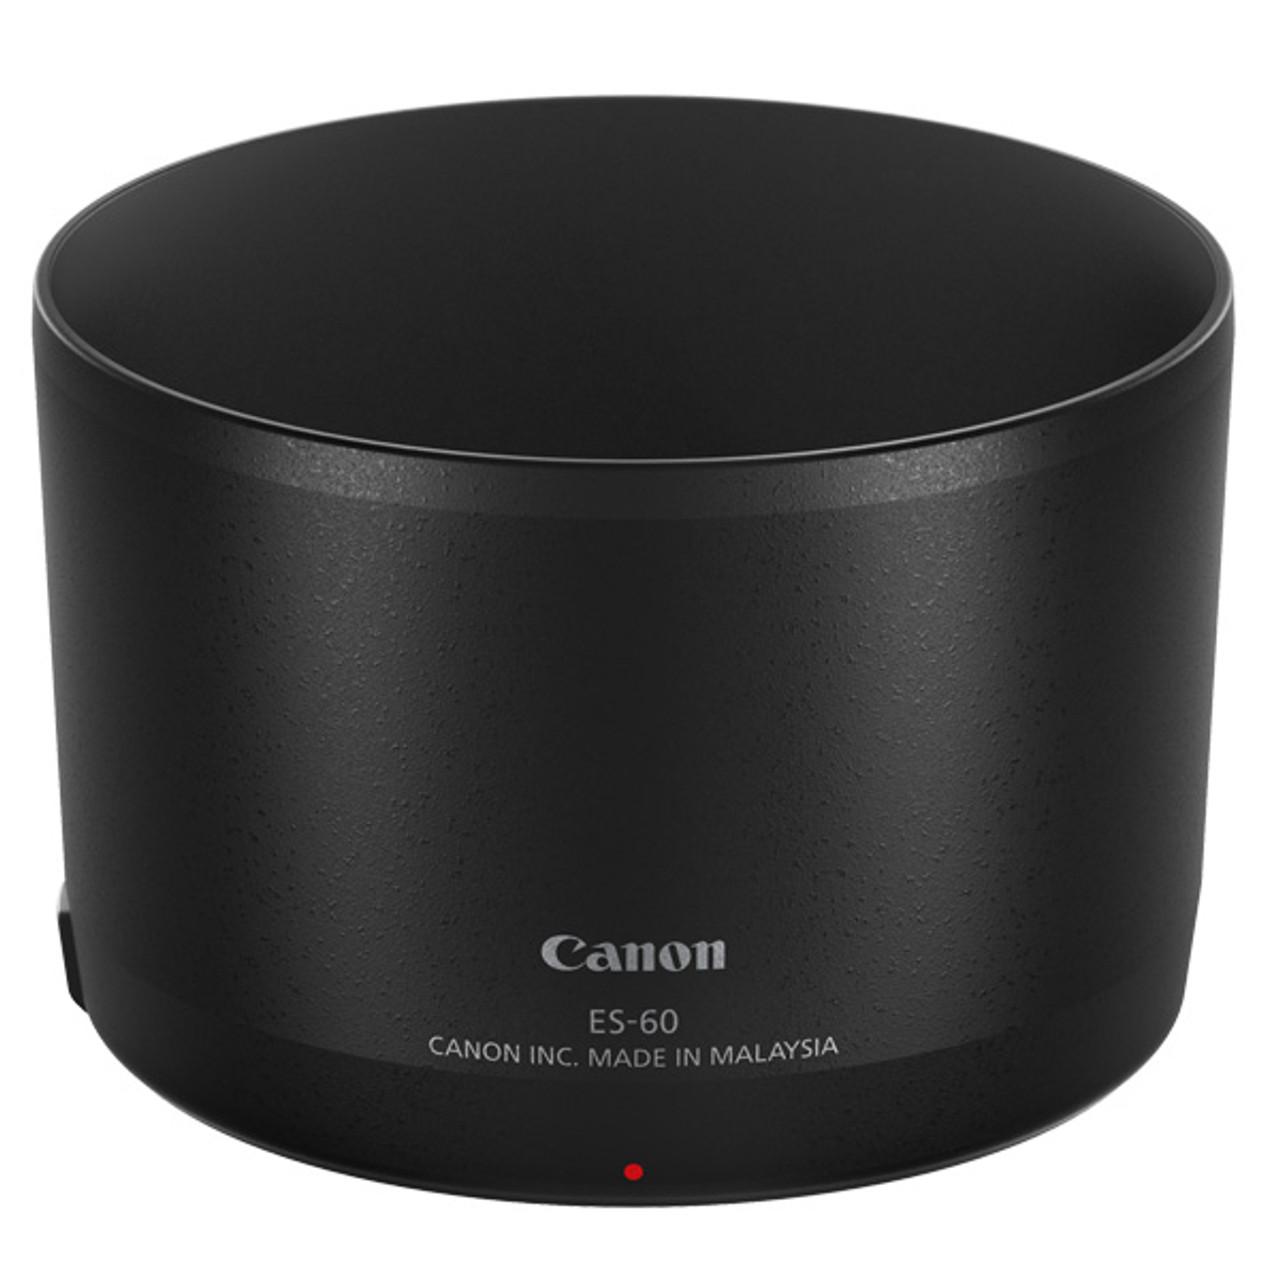 Canon ES-60 Lens Hood